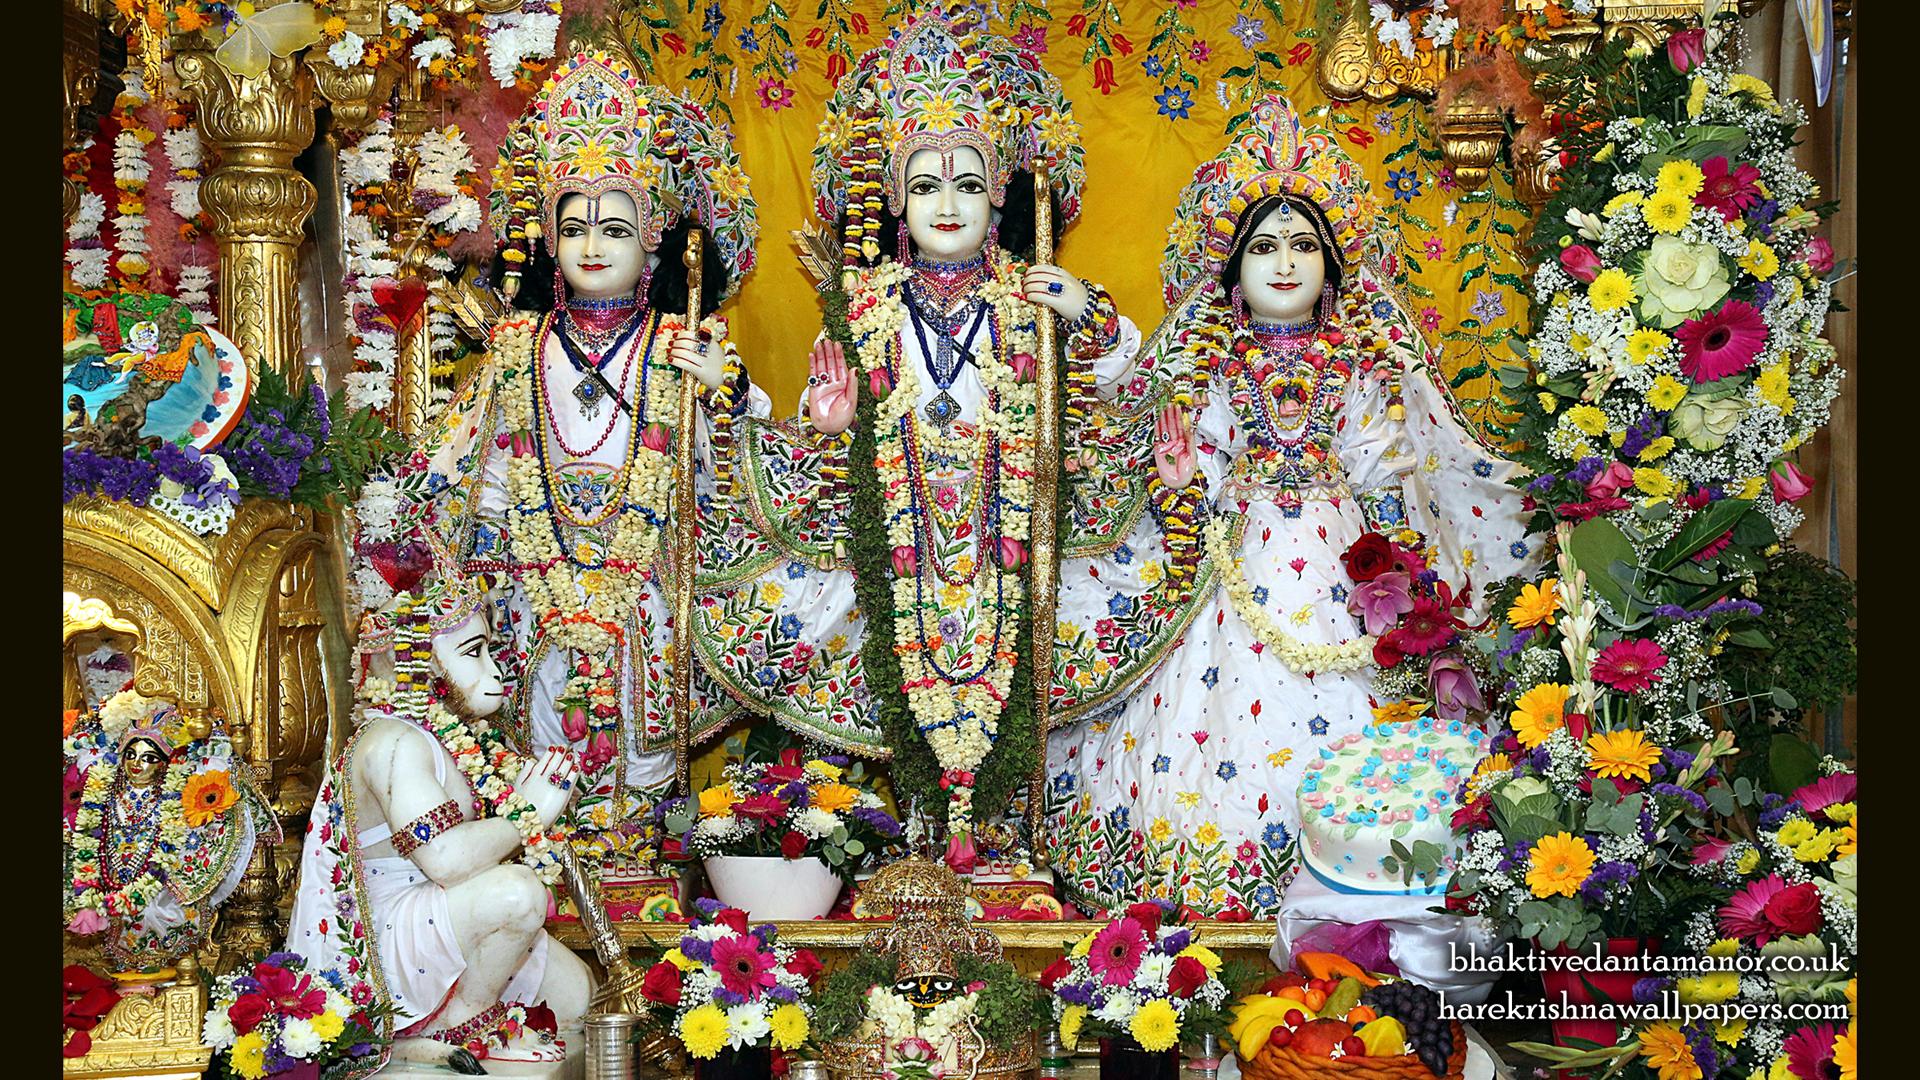 Sri Sri Sita Rama Laxman Hanuman Wallpaper (014) Size 1920x1080 Download